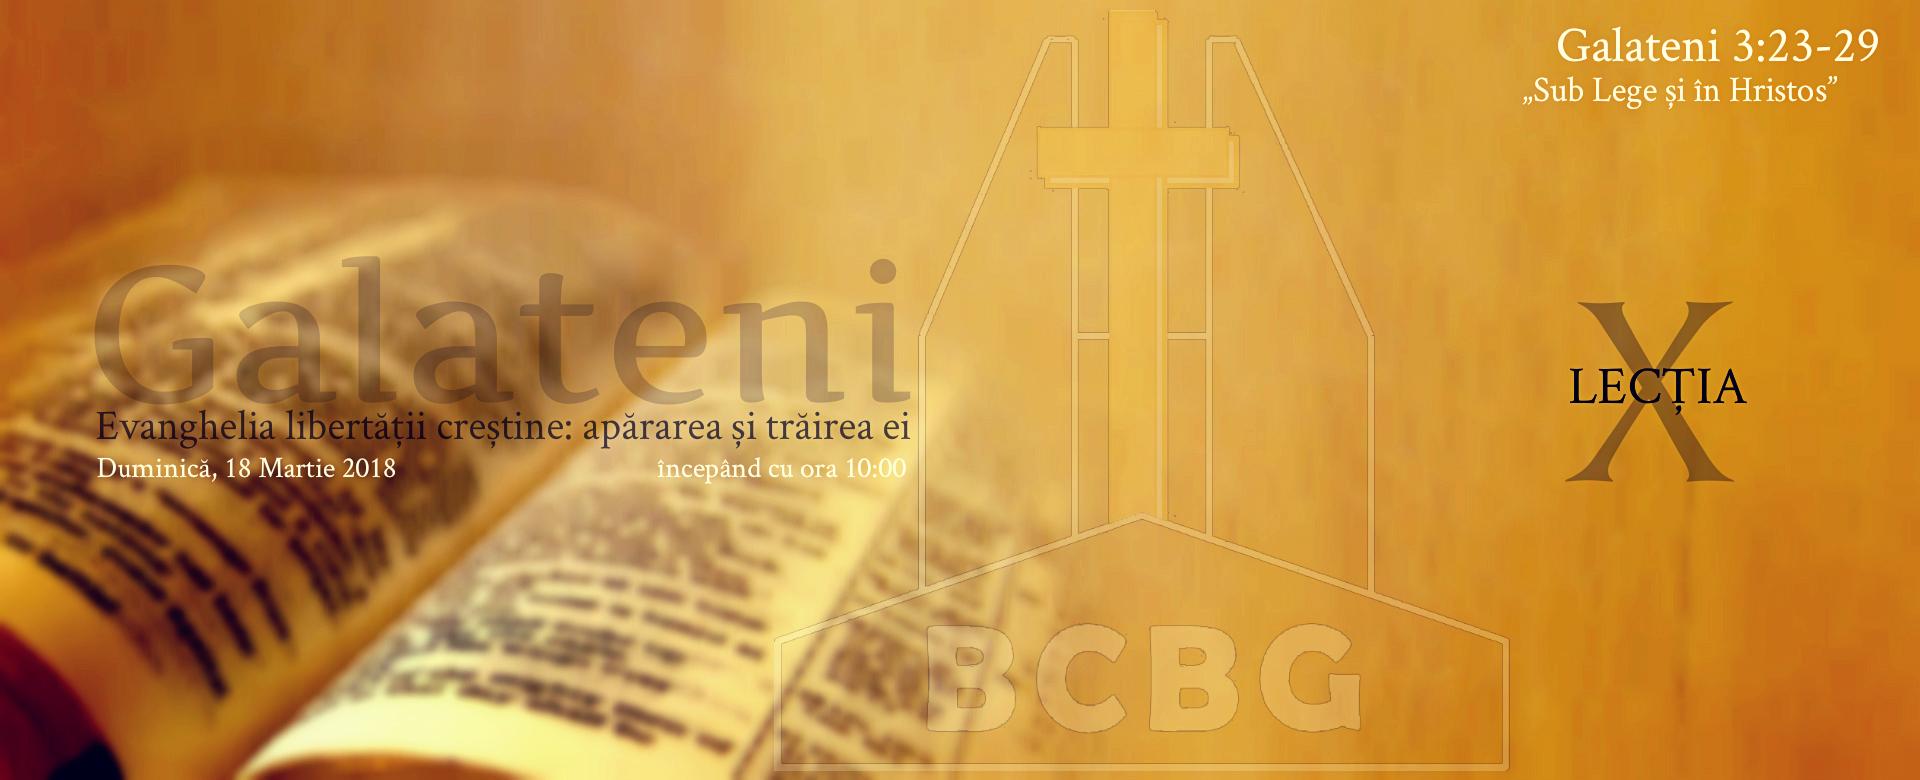 Duminica-18-Martie-2018-Studiu-Biblic-Galateni-3.23-29